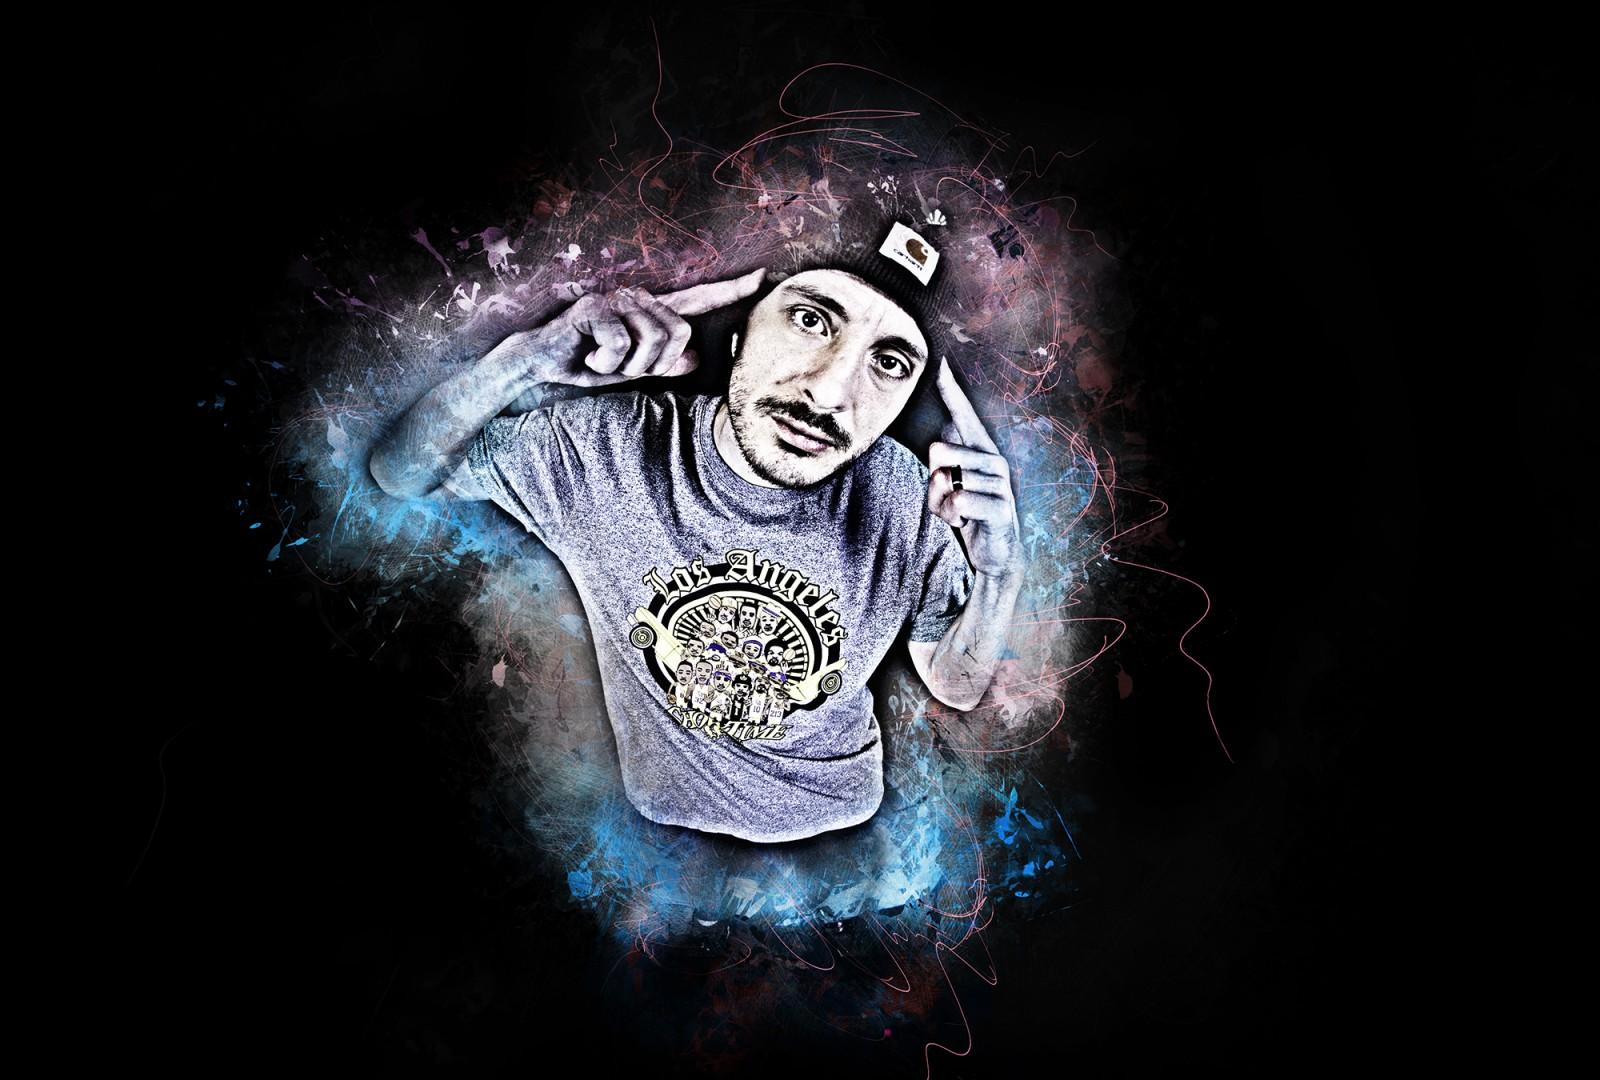 planb-studio-hiphop-gland-shooting-post-prod-motiongraphic-graphistegeneve-graphistelausanne-graphistefreelance-montage-fred-muller-fredmuller-graphisteindependant-redstar